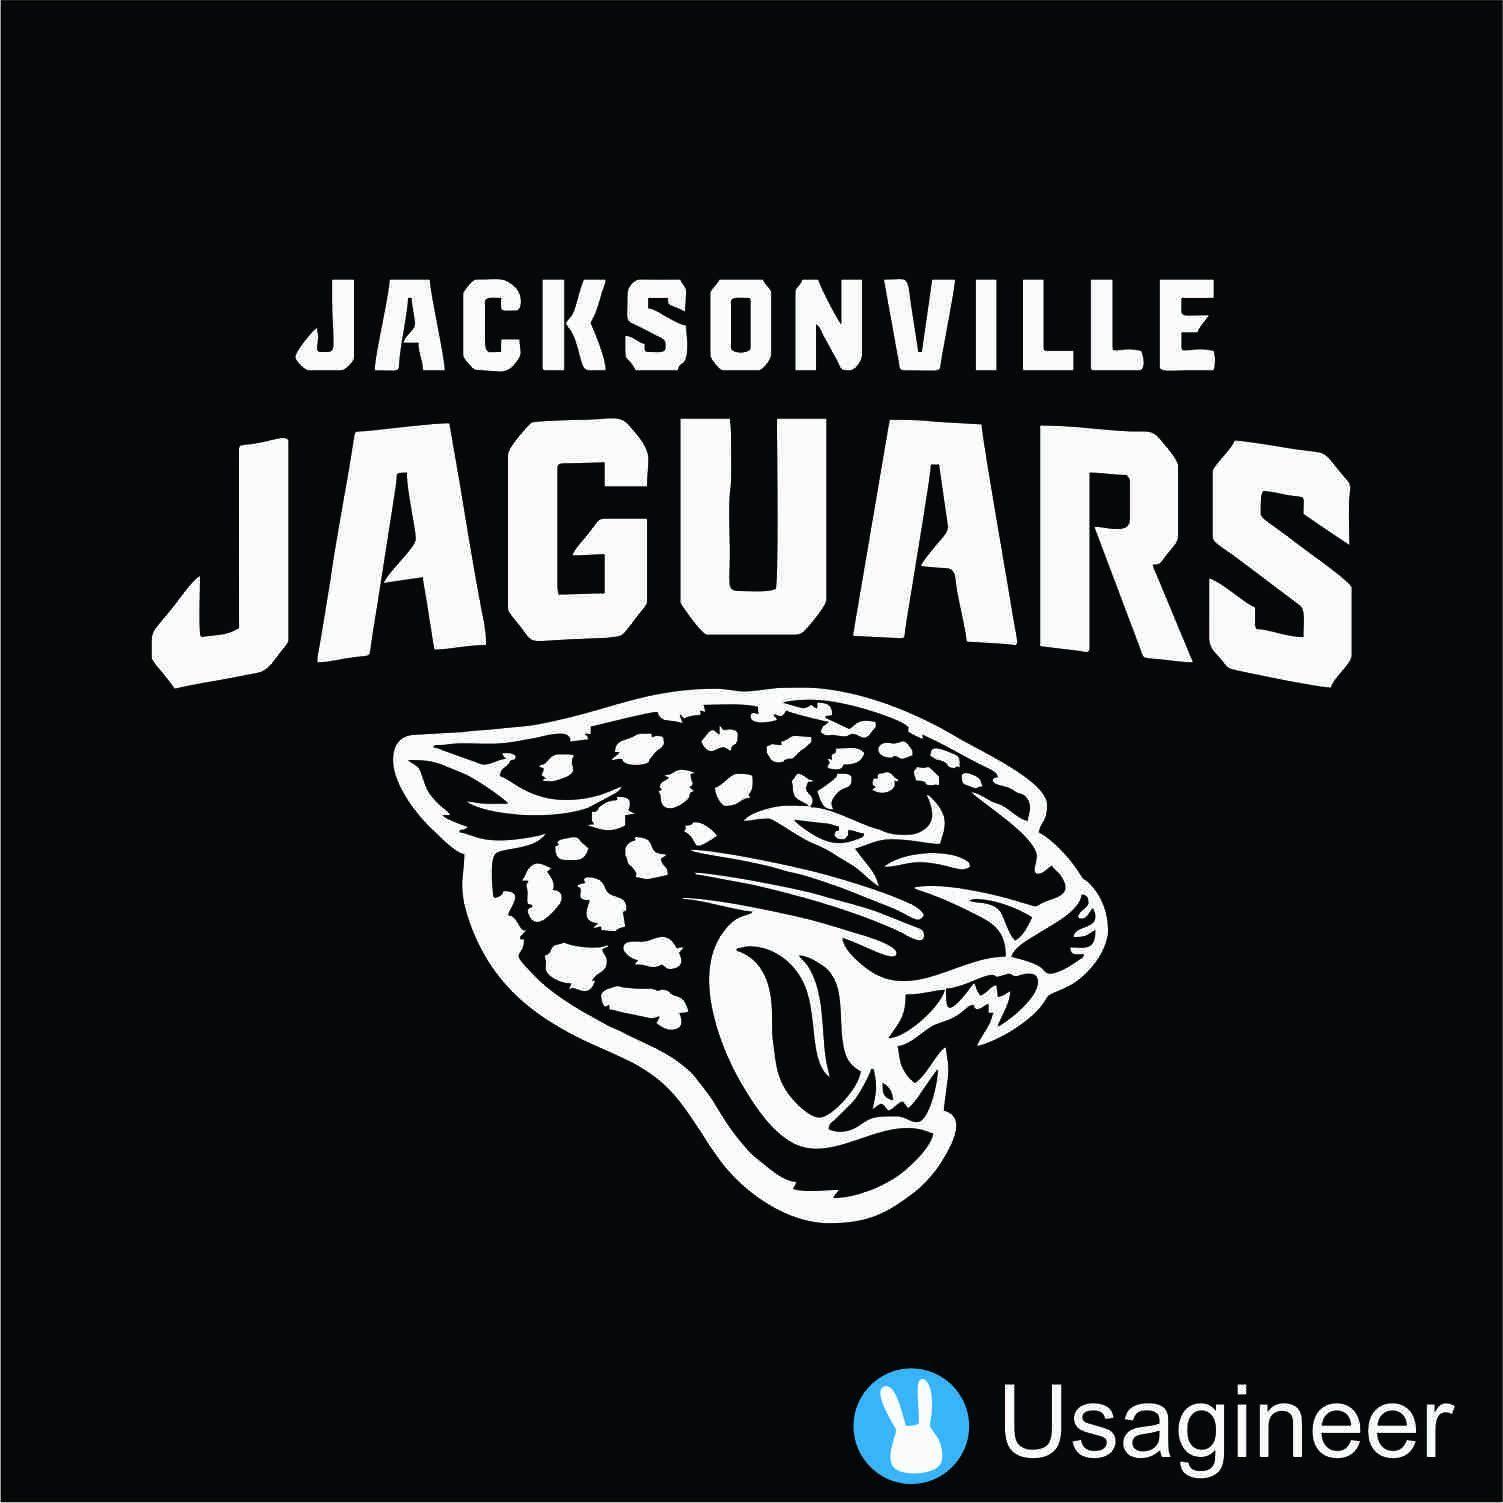 JACKSONVILLE JAGUARS NFL Sports VINYL DECAL STICKER